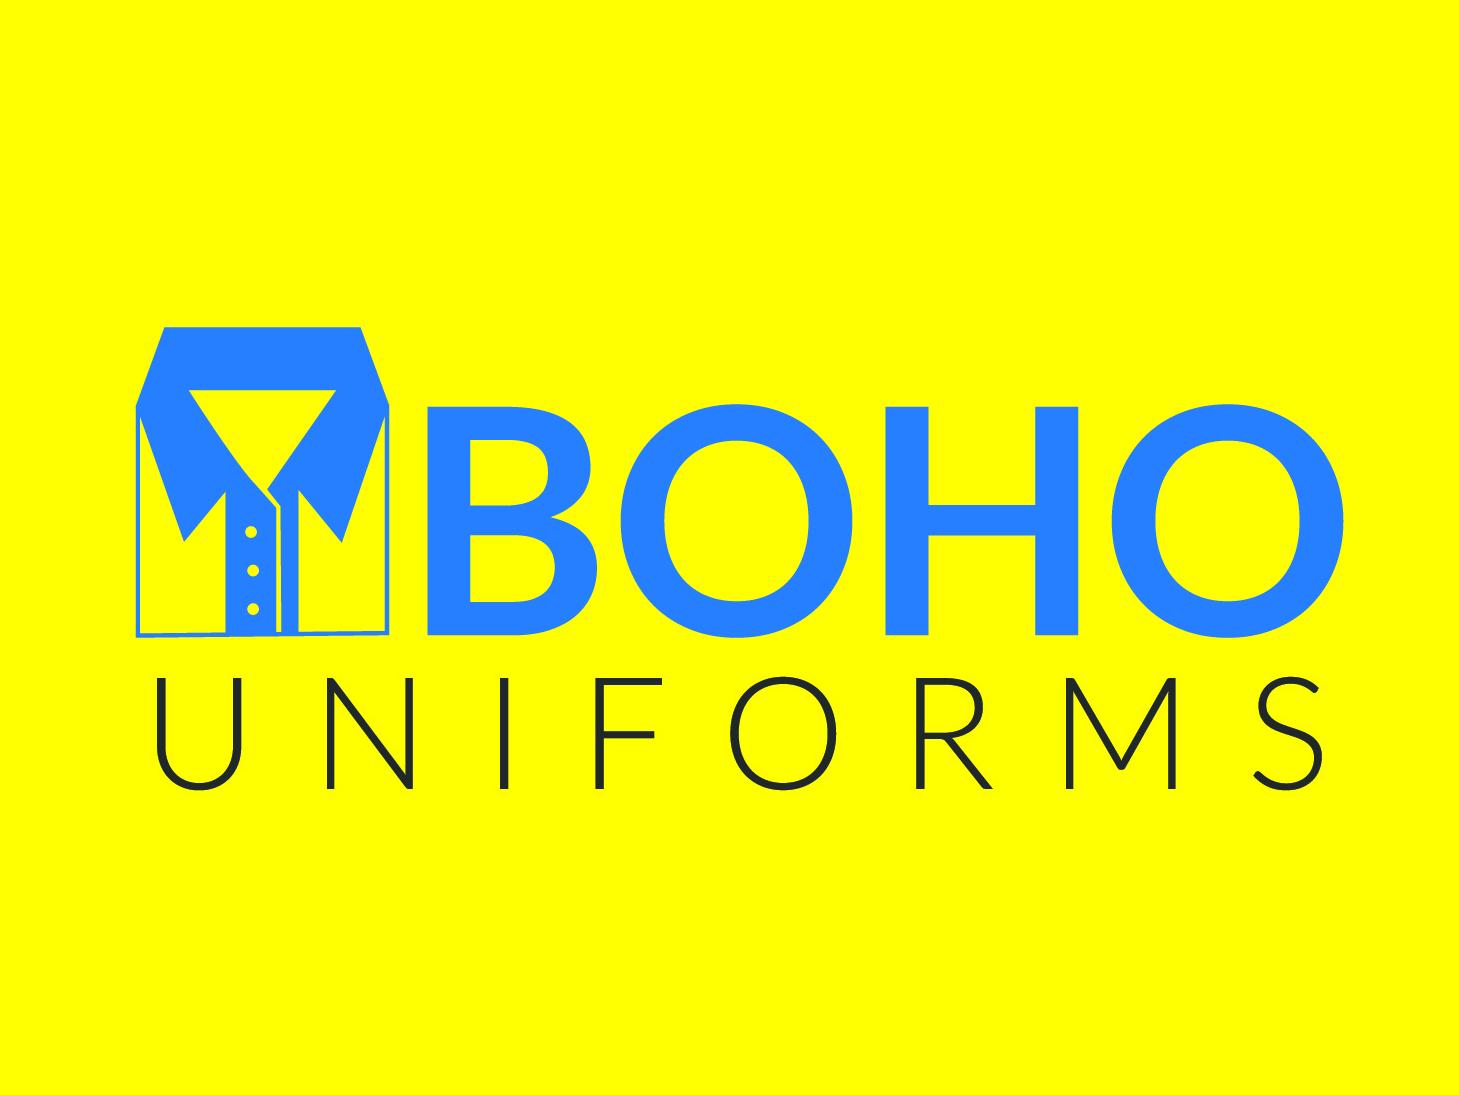 Boho Uniforms Logo2 identity market place online business brand market illustration photoshop business unique mordern vector minimal branding creative flat logo design icon logo design graphic design